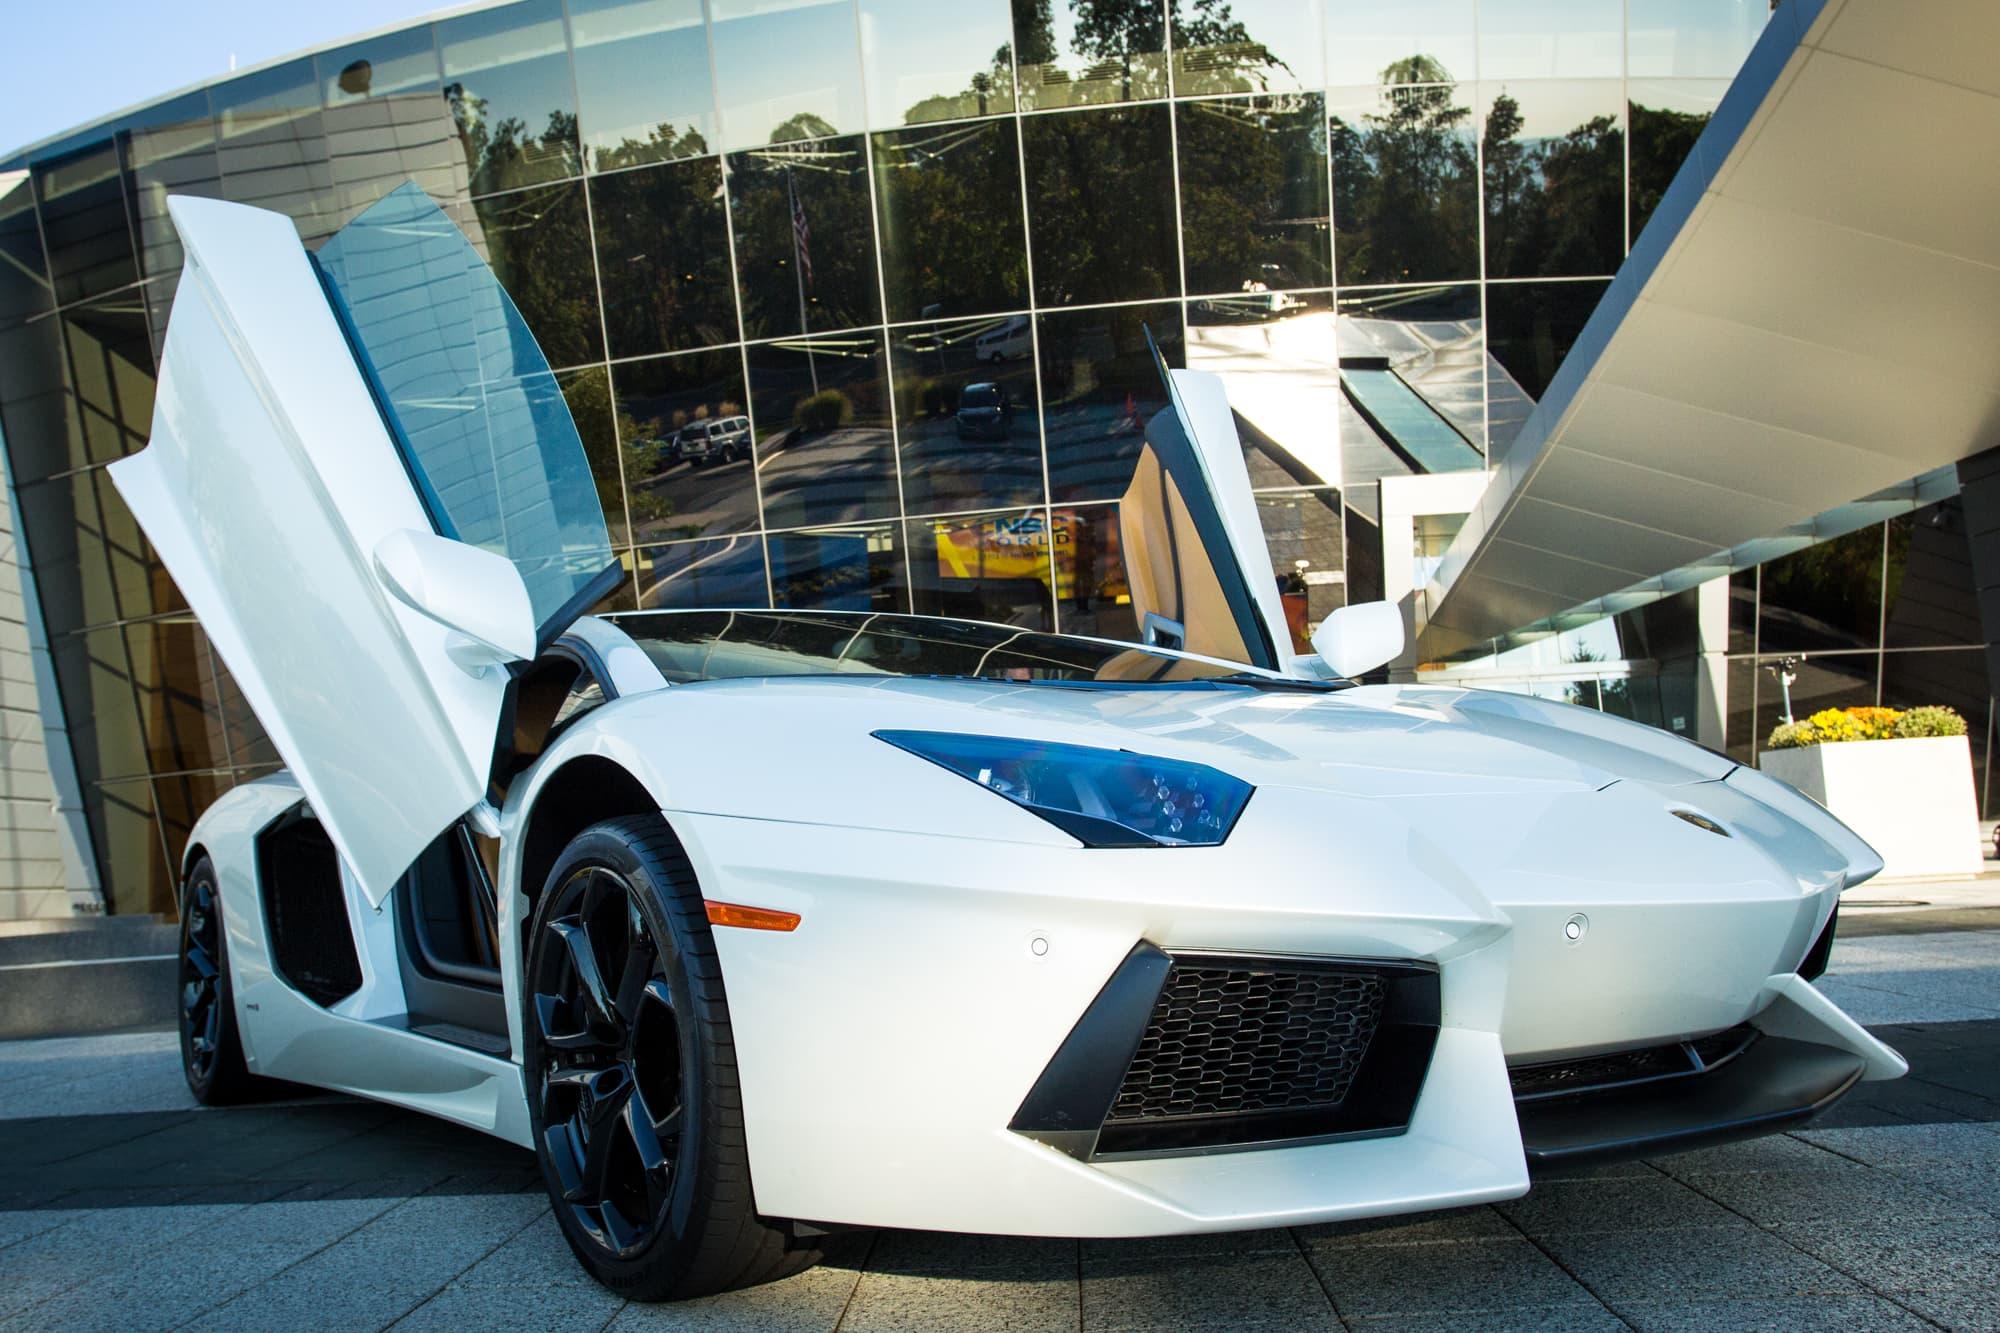 Lamborghini S Boy Wonder Of Sales